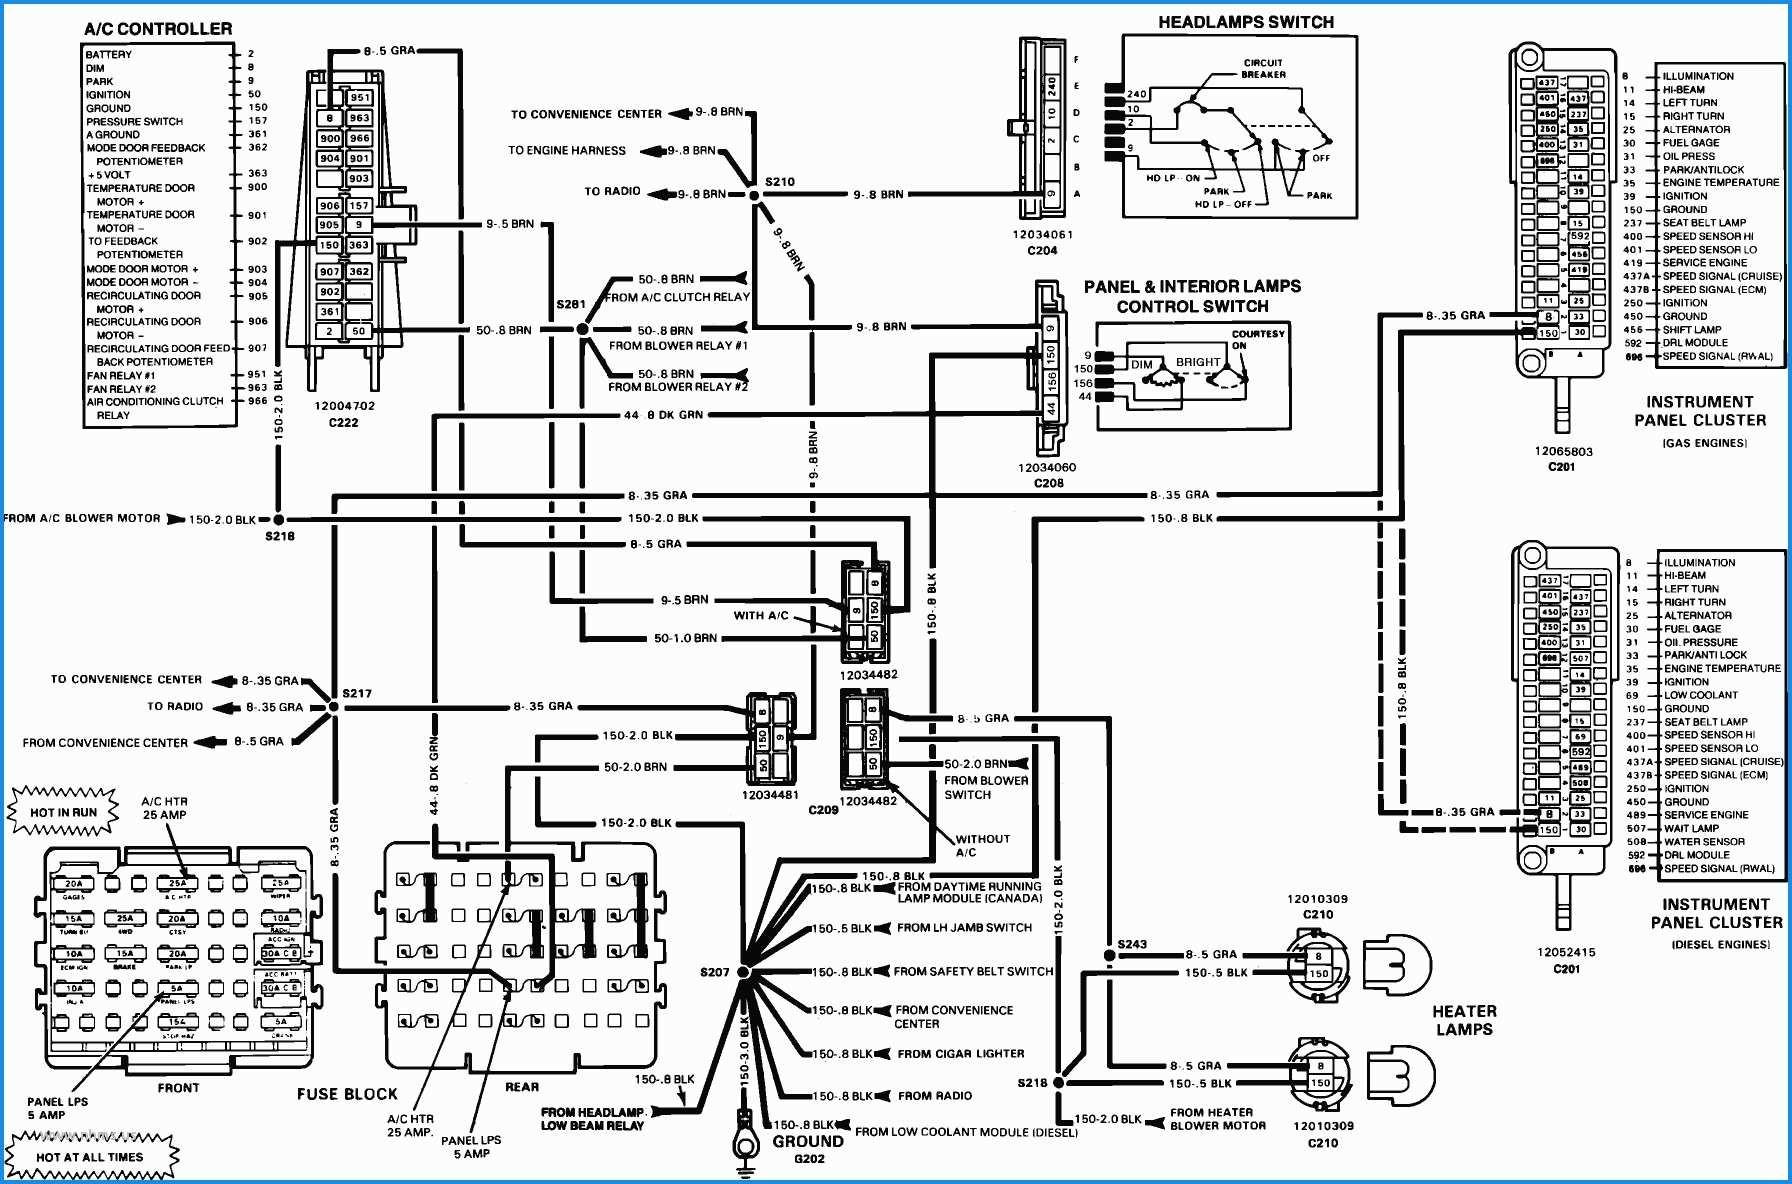 2004 Serria 6.0 Fuel Pump Wiring Diagram] 1984 Gmc High Sierra Wiring Diagram Full Version Hd Of 2004 Serria 6.0 Fuel Pump Wiring